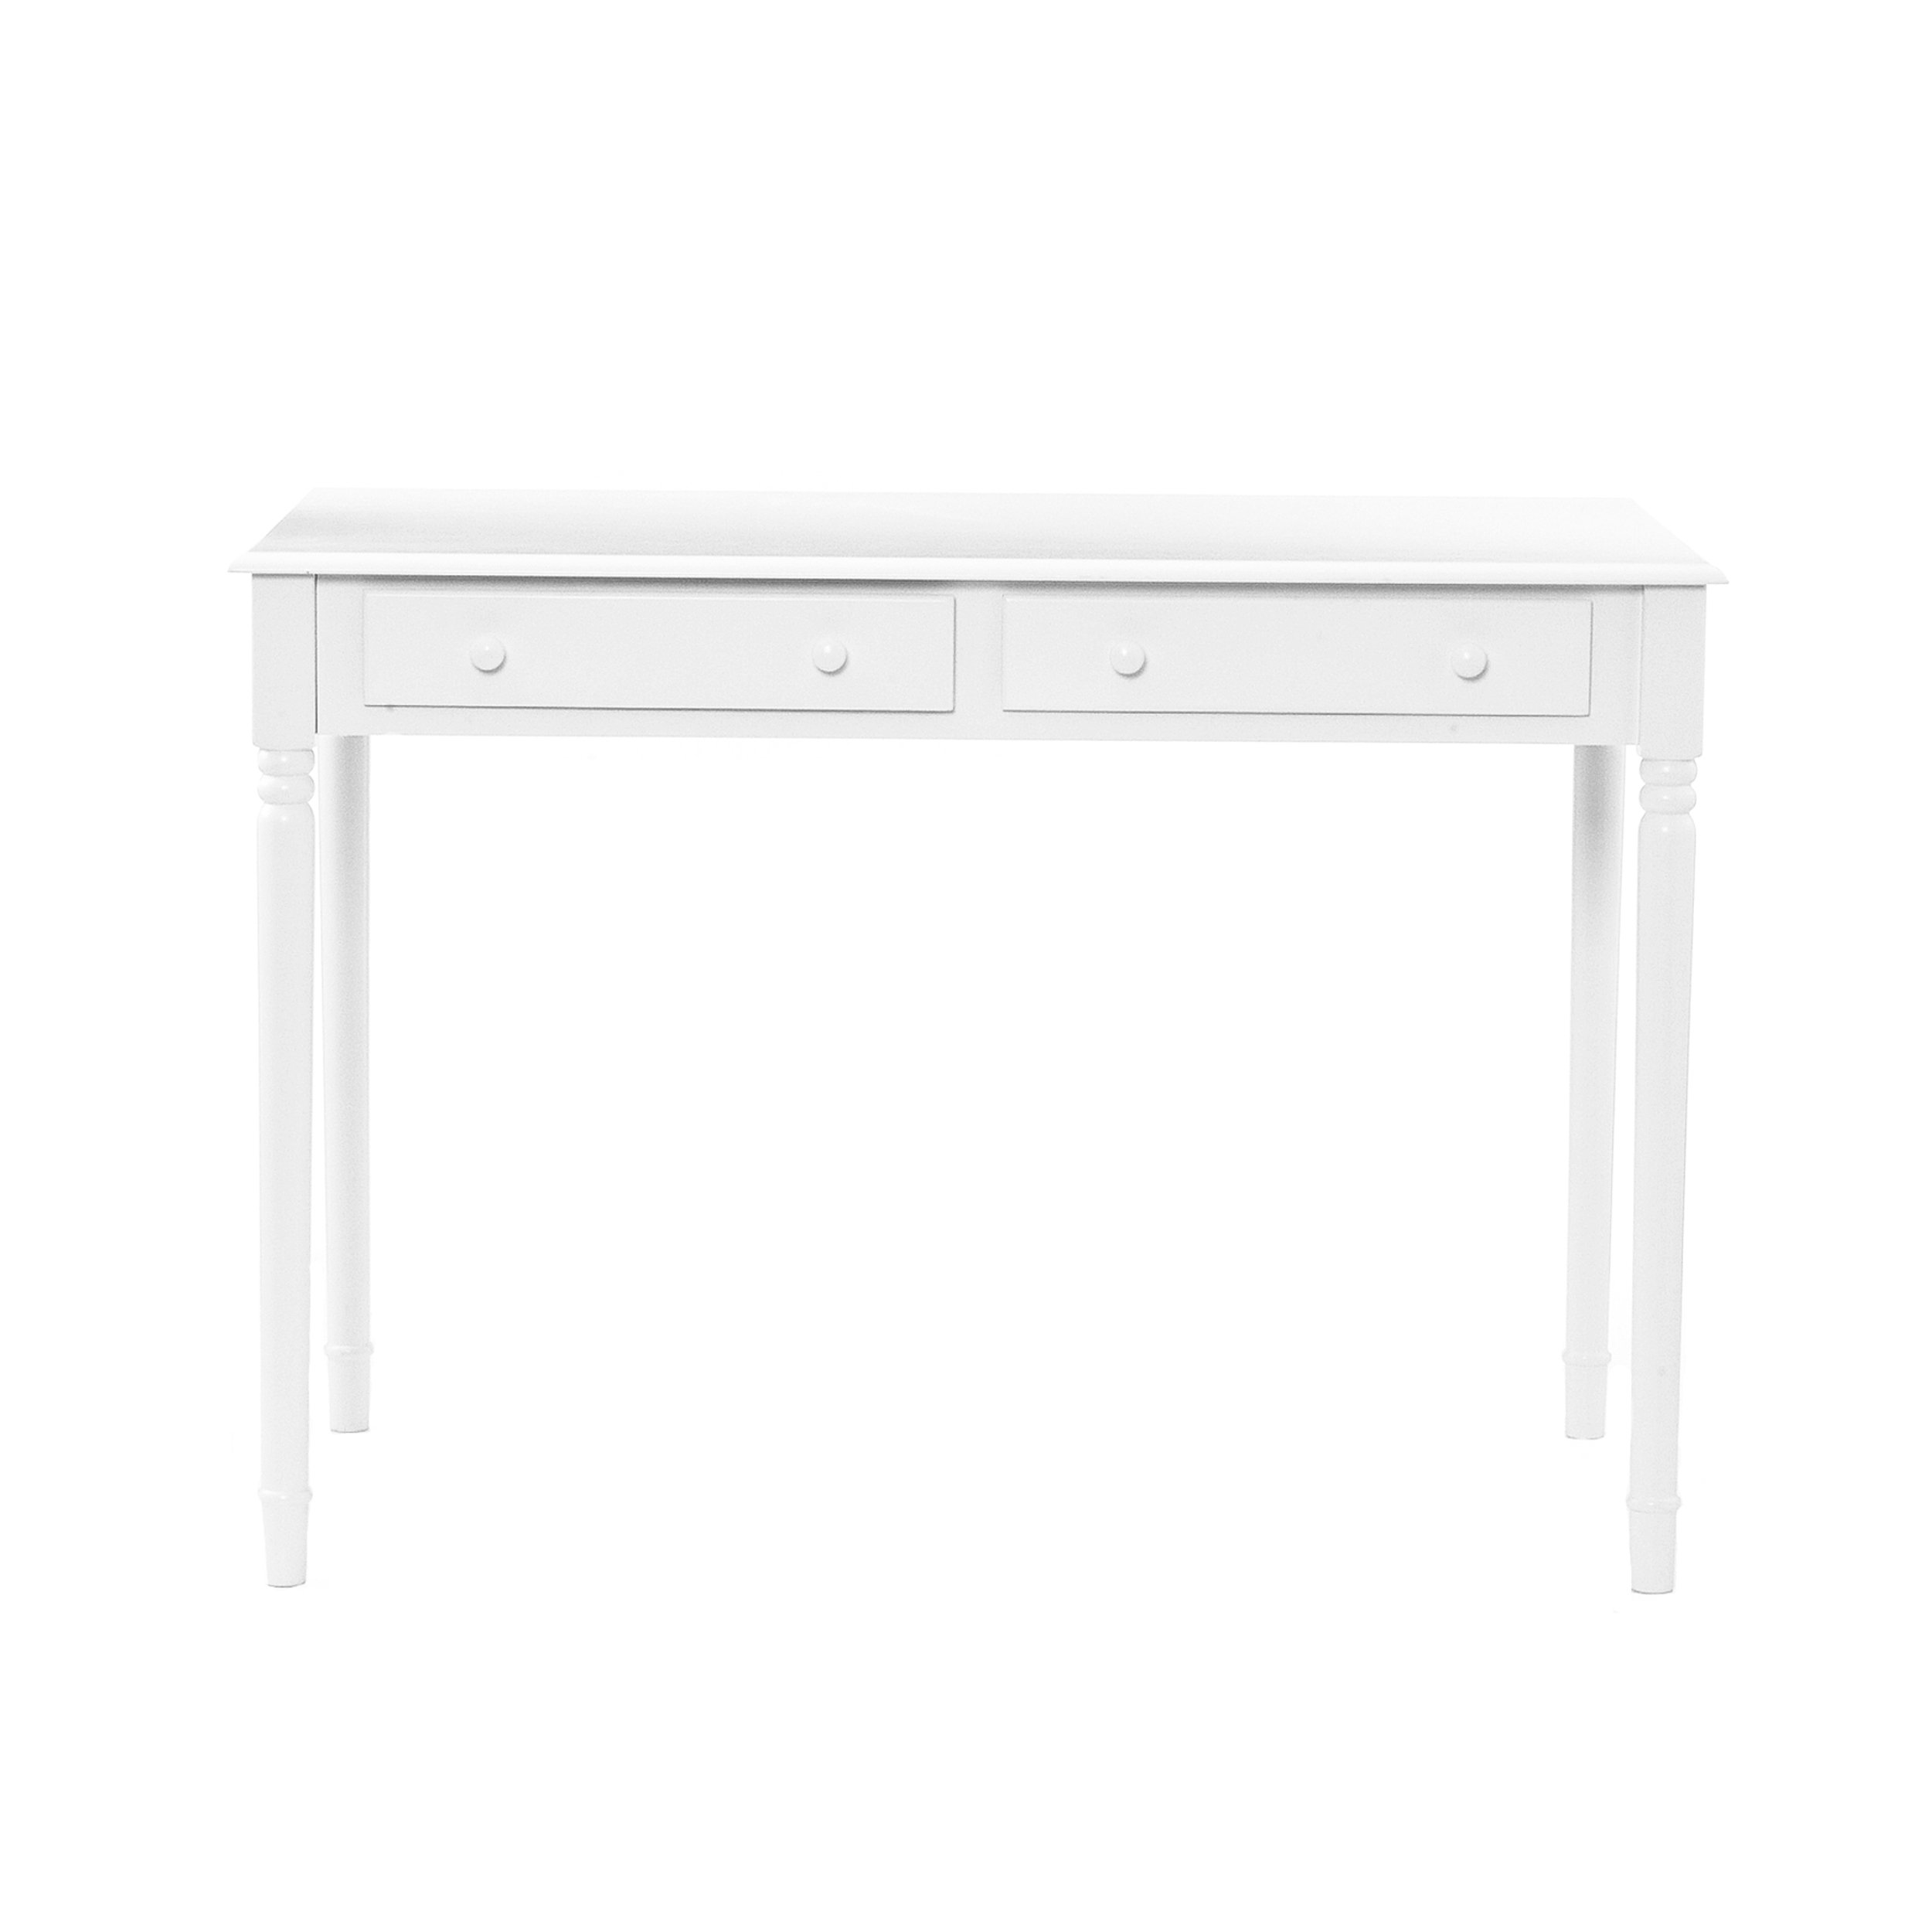 Southern Enterprises 2 Drawer Writing Desk 42'' Wide, Crisp White Finish by Southern Enterprises